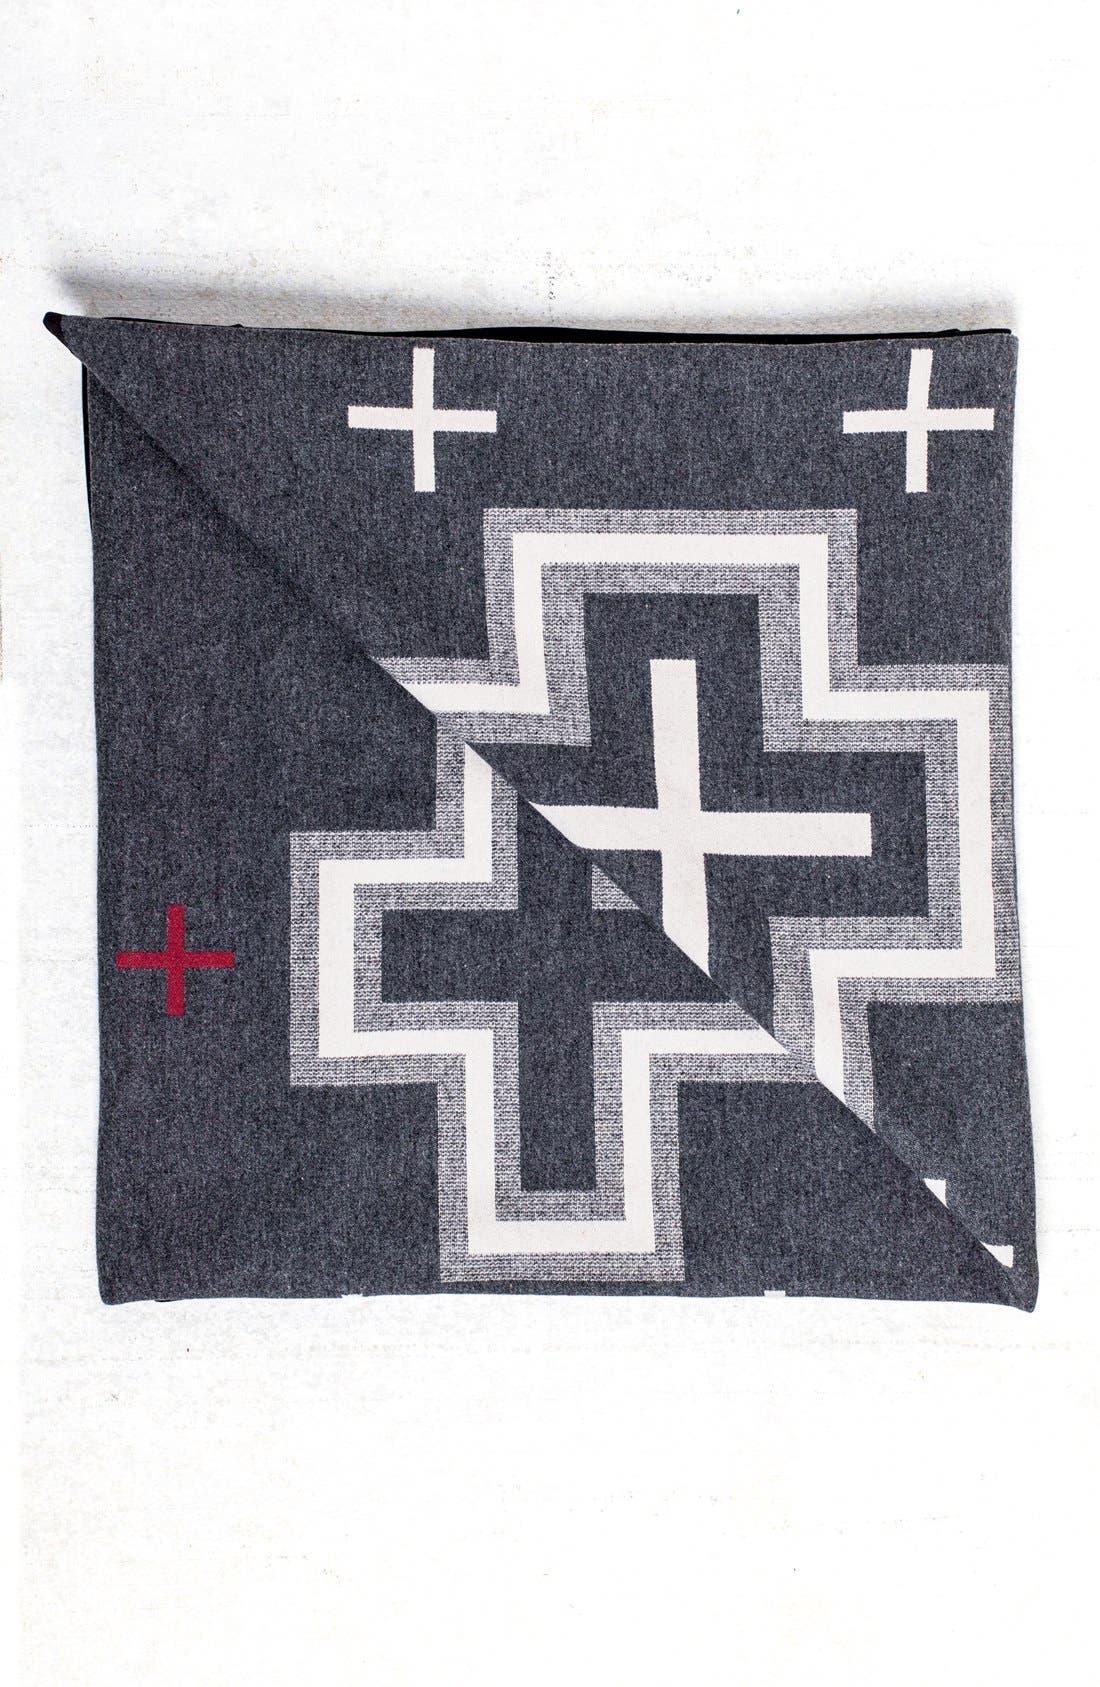 Alternate Image 1 Selected - Pendleton 'San Miguel' Queen Wool & Cotton Blanket